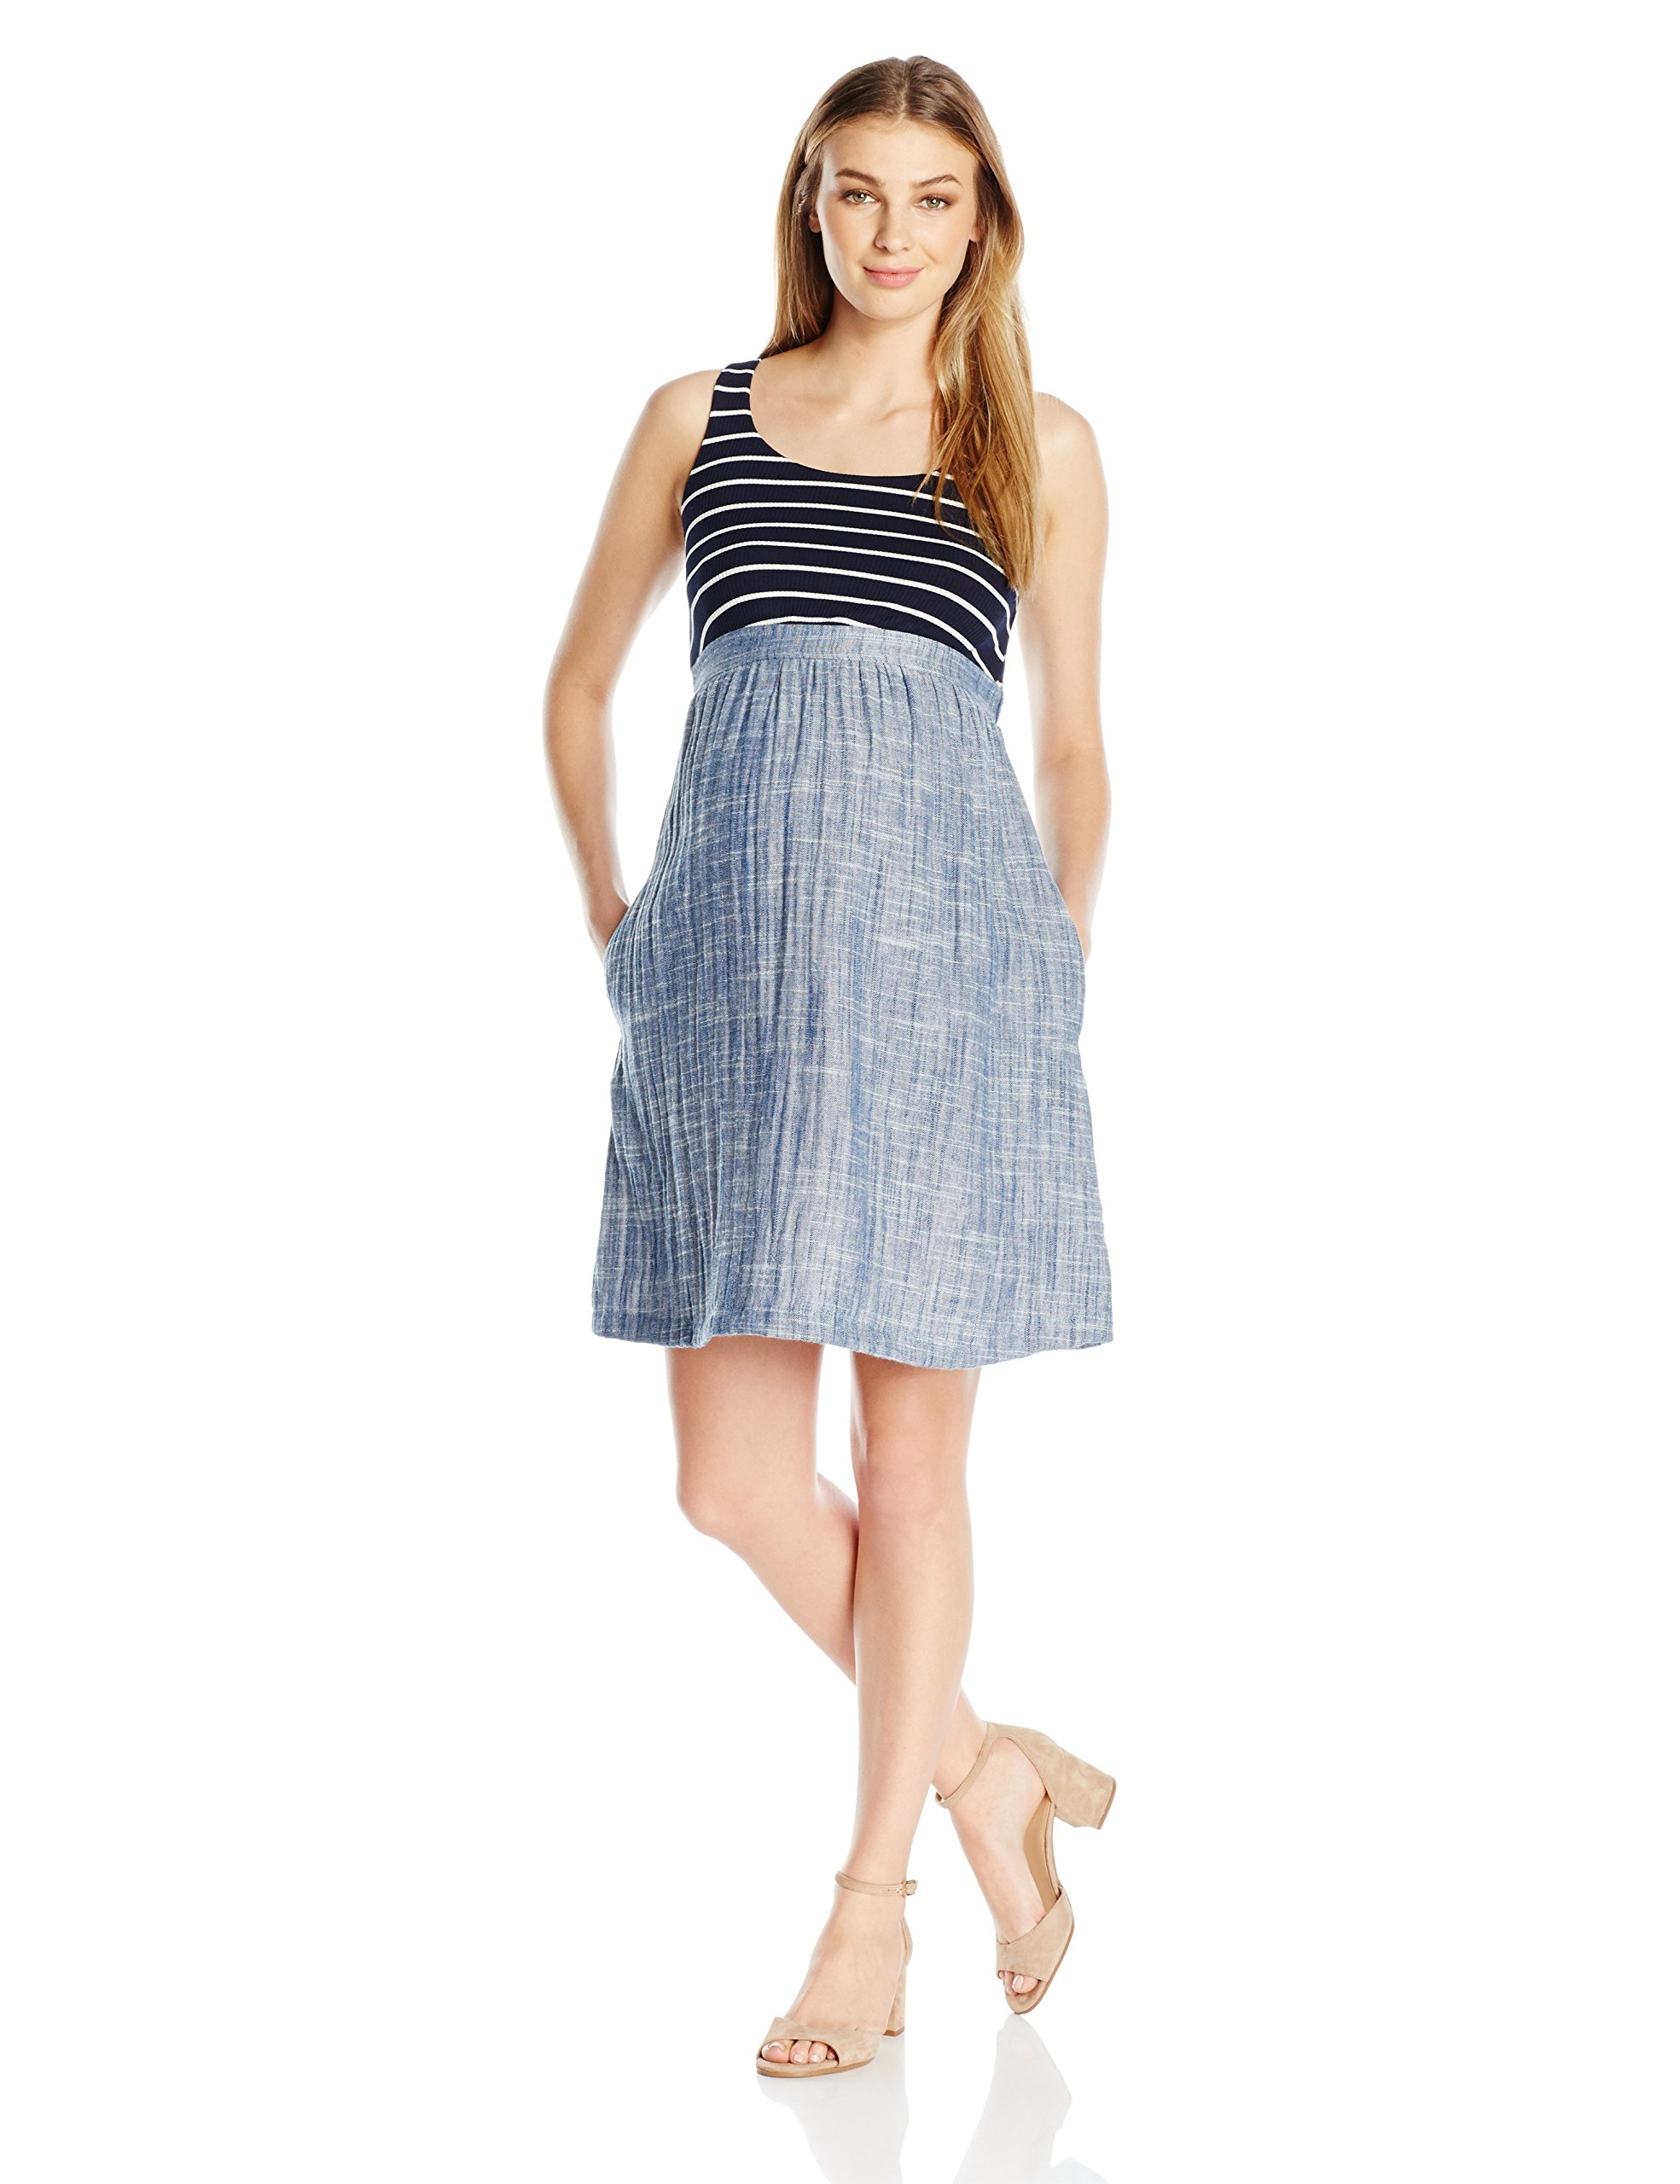 Maternal America Women's Maternity Empire Dress, Navy Stripes/Indigo Blue, L